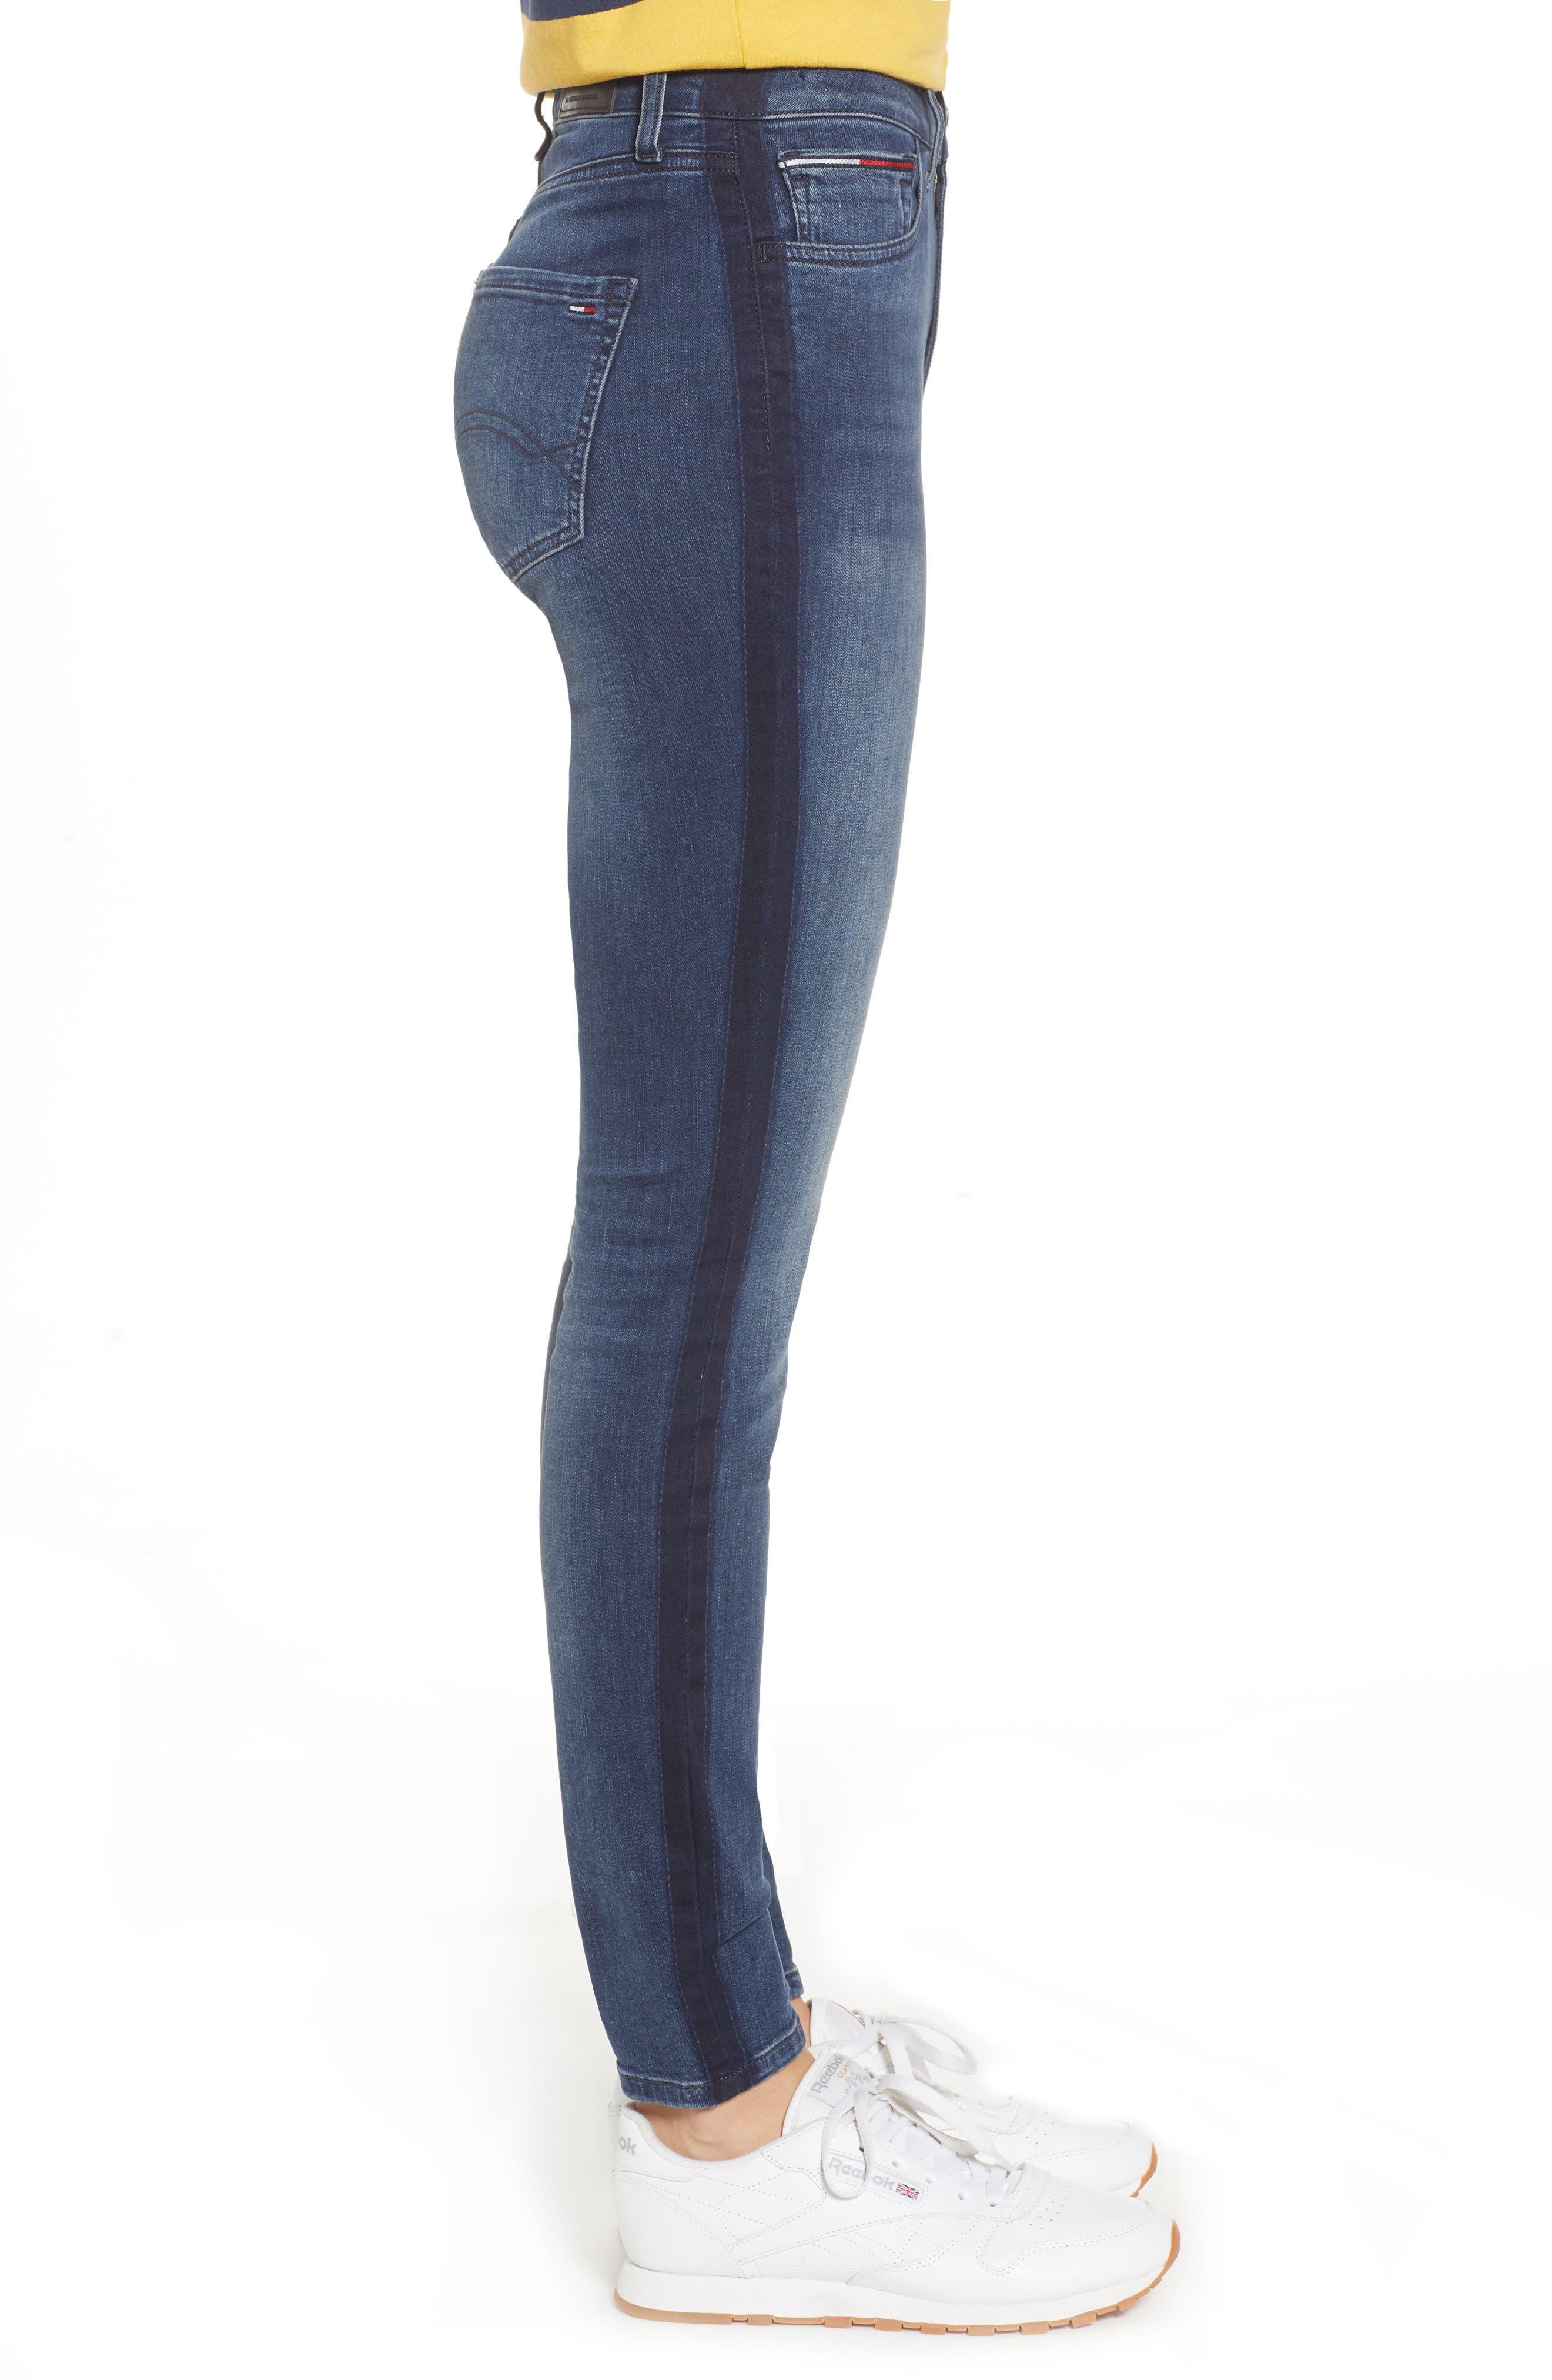 Santana High Waist Skinny Jeans,                             Alternate thumbnail 3, color,                             NEDDLE DARK BLUE STRETCH